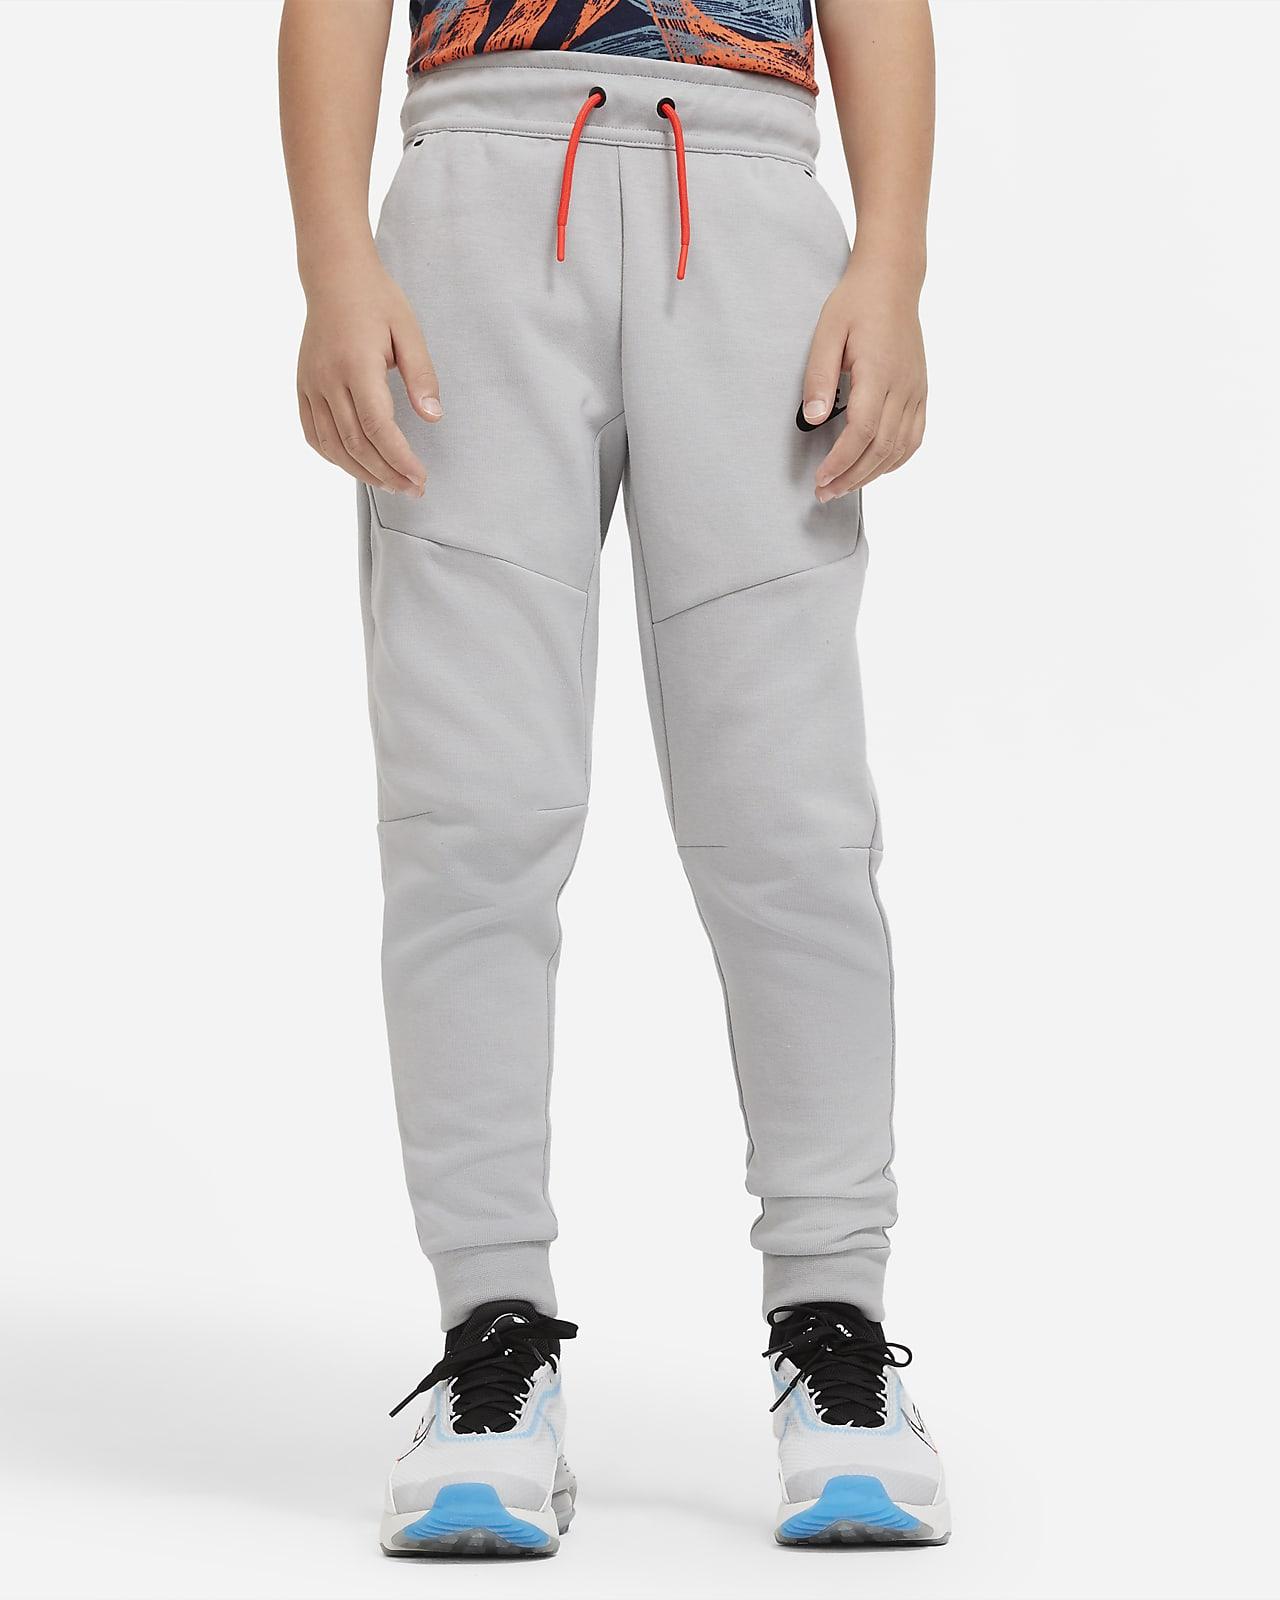 Nike Sportswear Tech Fleece Hose für ältere Kinder (Jungen)